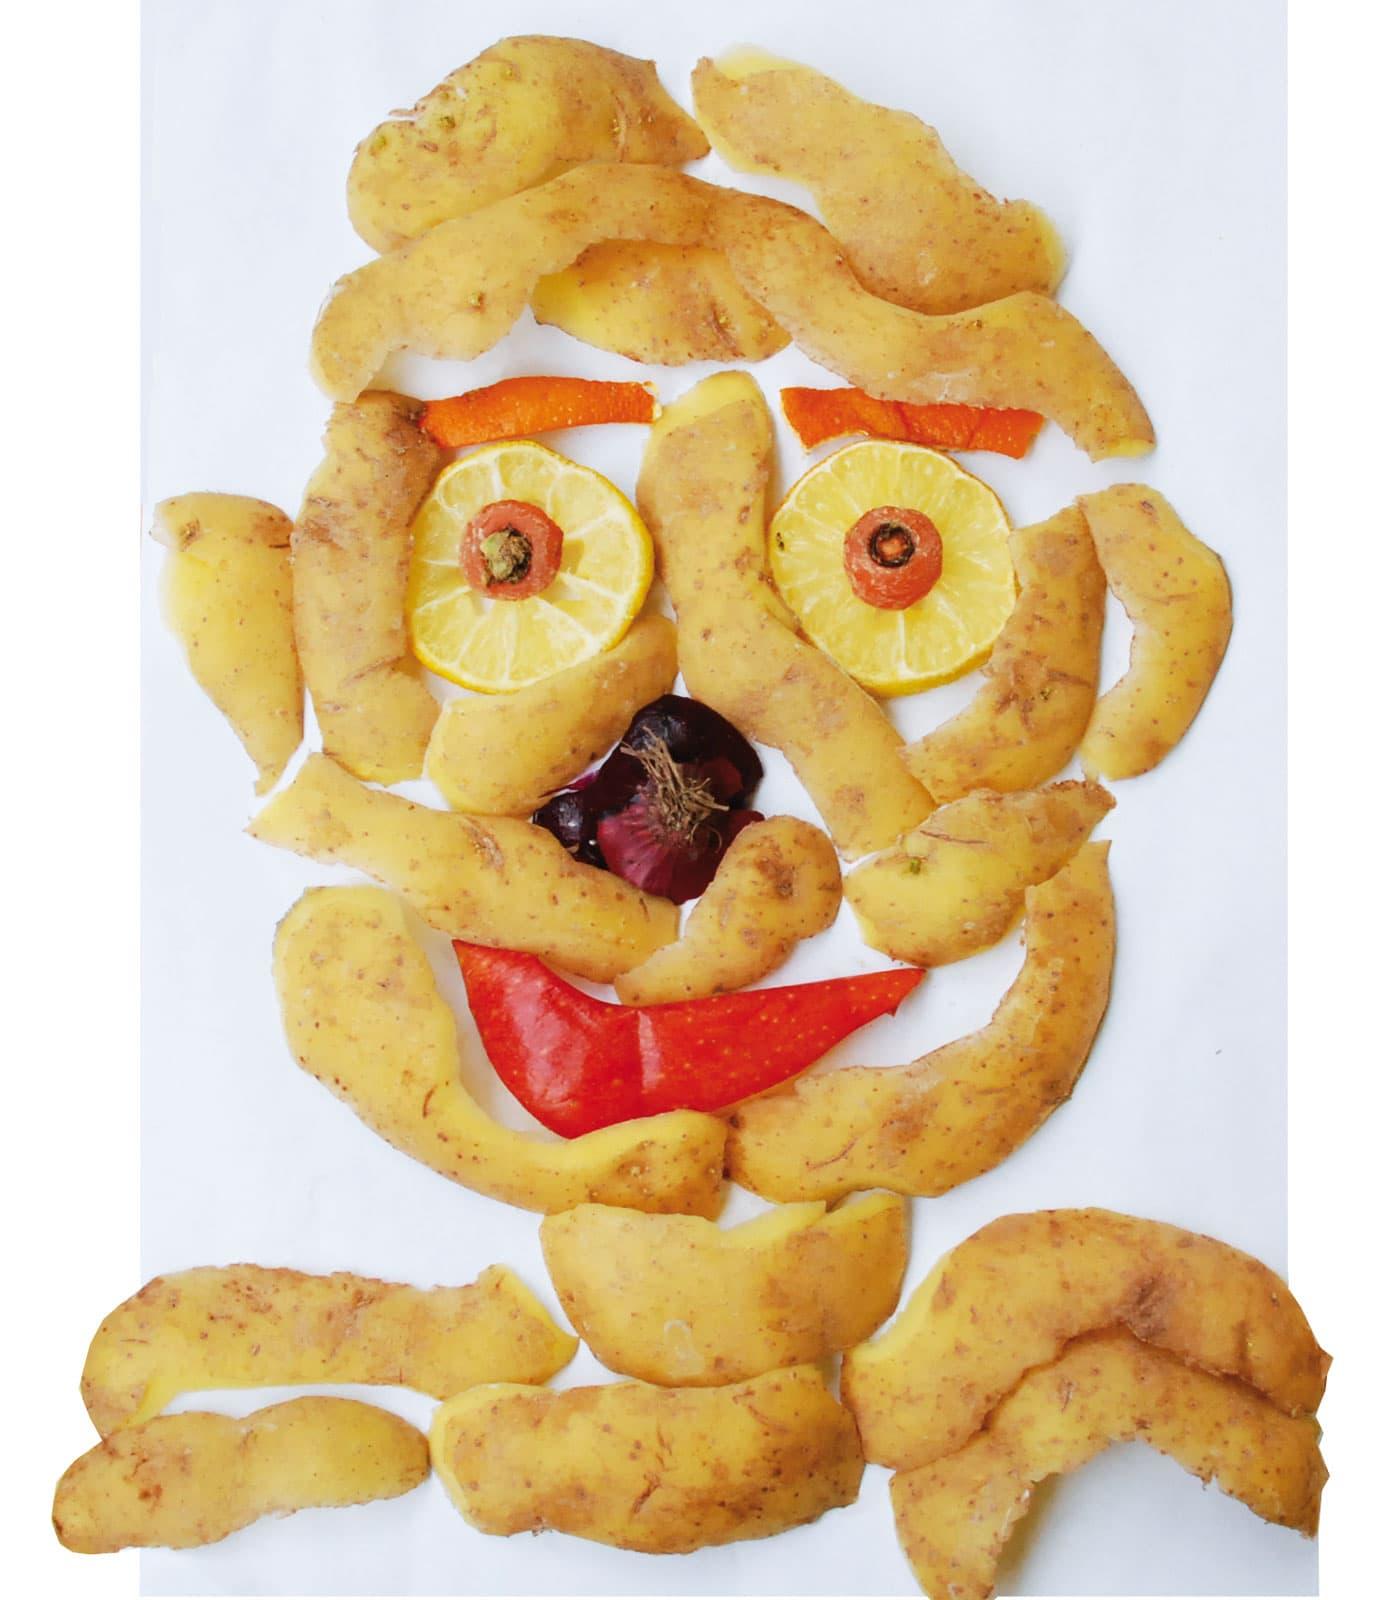 Jugend im Museum – Kreative Projekte für Kinder: Gsichter aus Kartoffelschalen// HIMBER